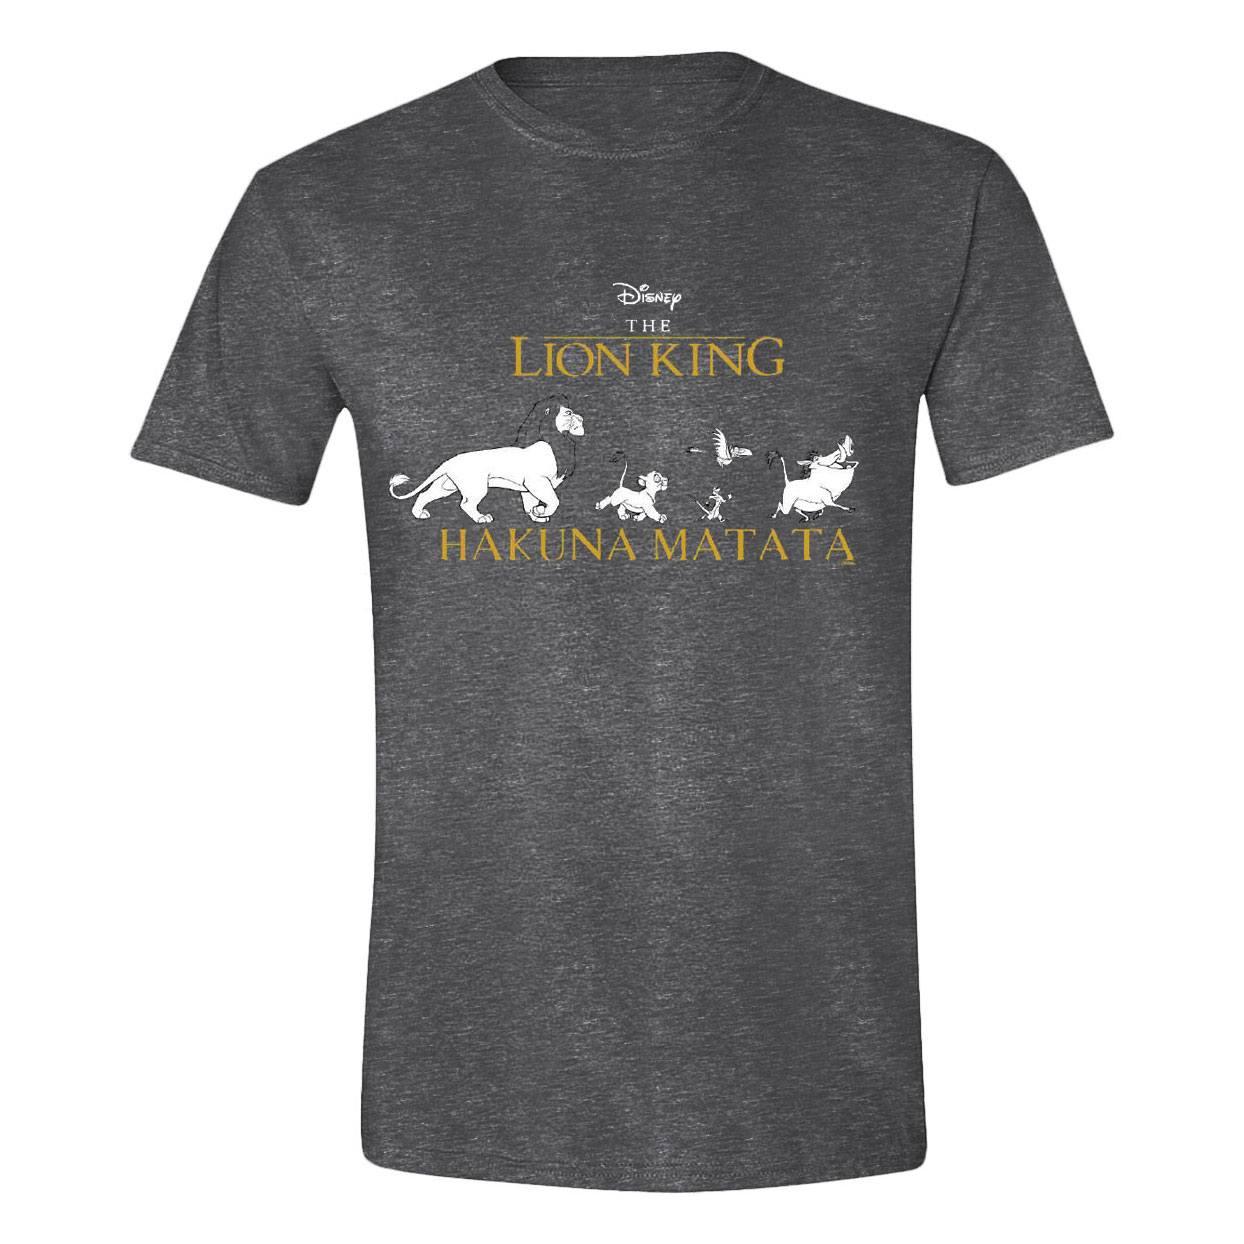 The Lion King T-Shirt Hakuna Matata Size M